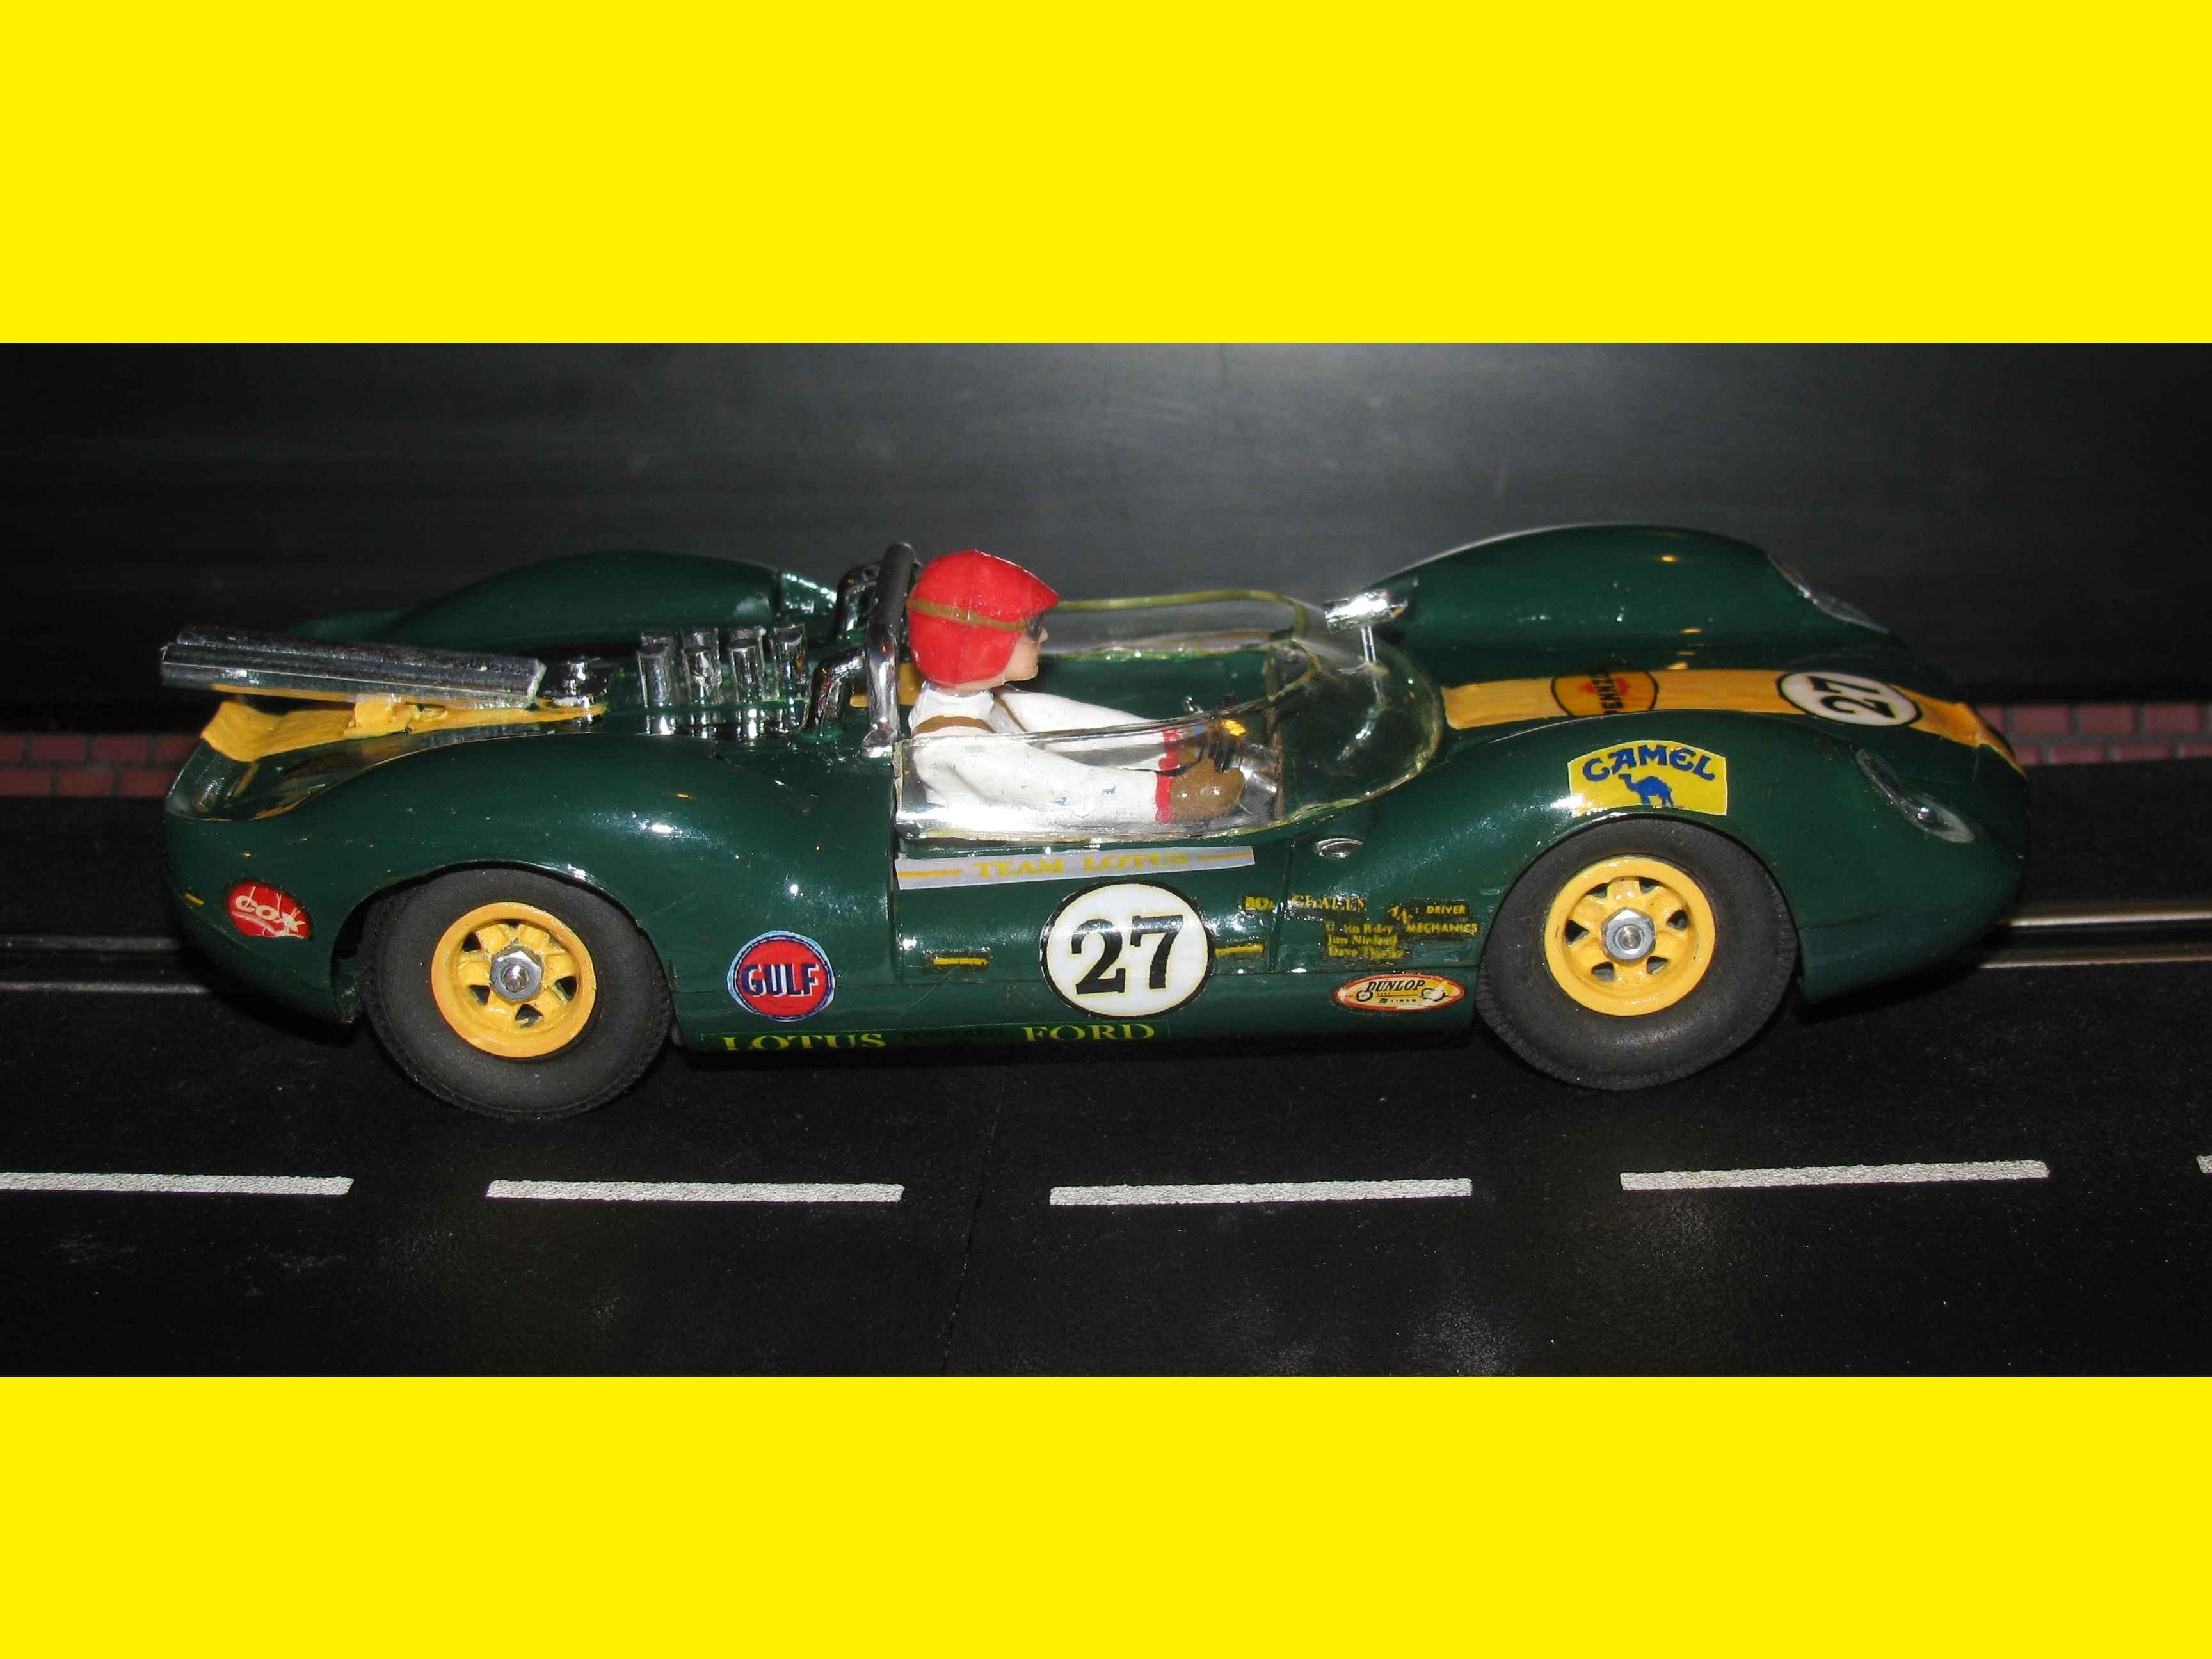 * SUMMER SALE * Vintage COX Lotus Type 40 Slot Car in 1/24 Scale Car #27